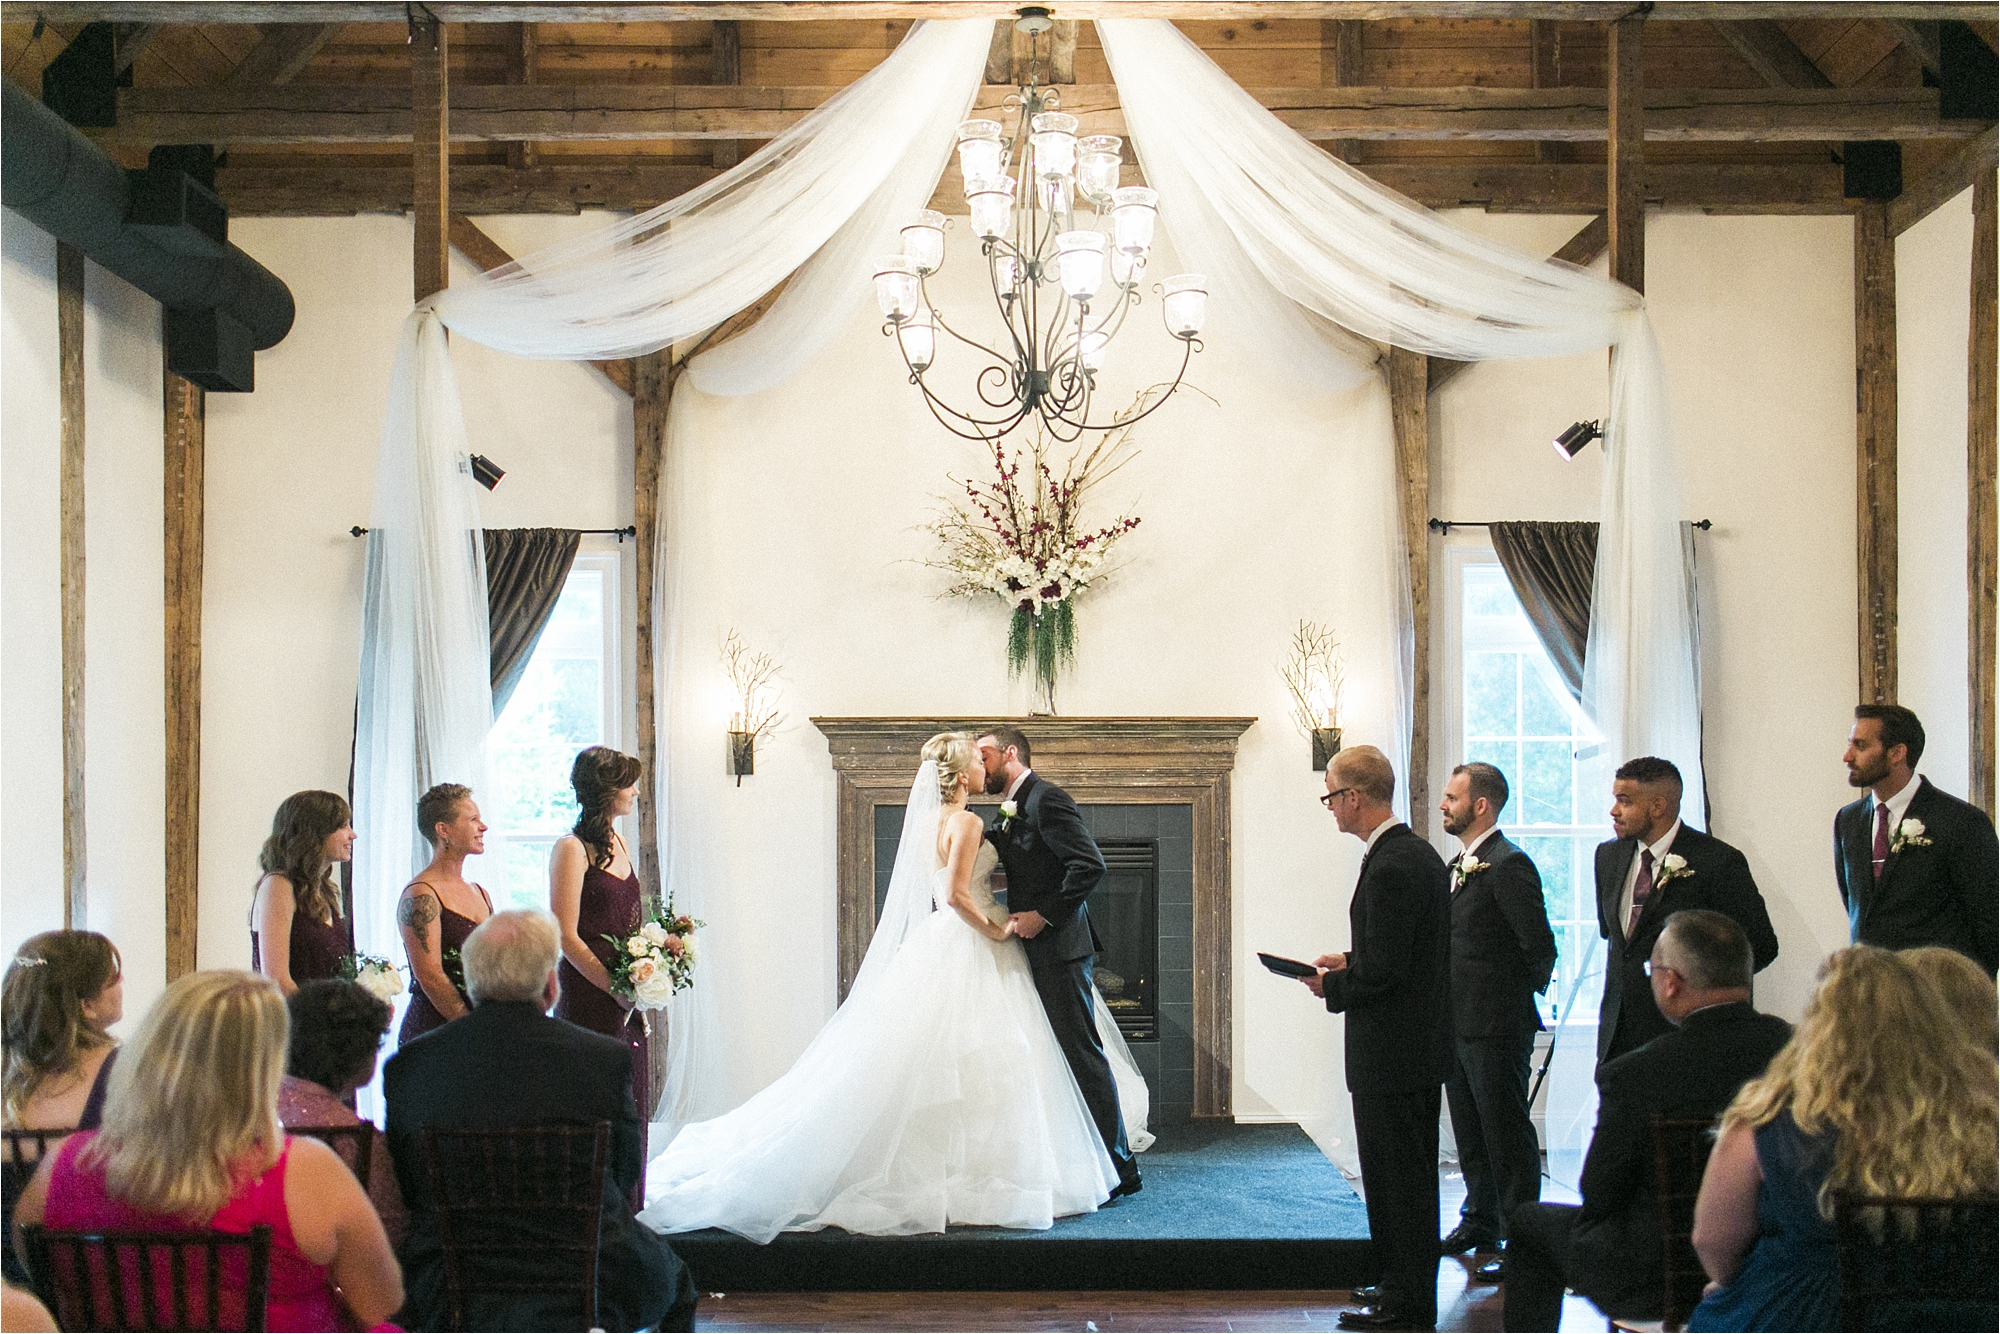 fredericksburg-virginia-stevenson-ridge-wedding-stephanie-yonce-photo_0028.jpg